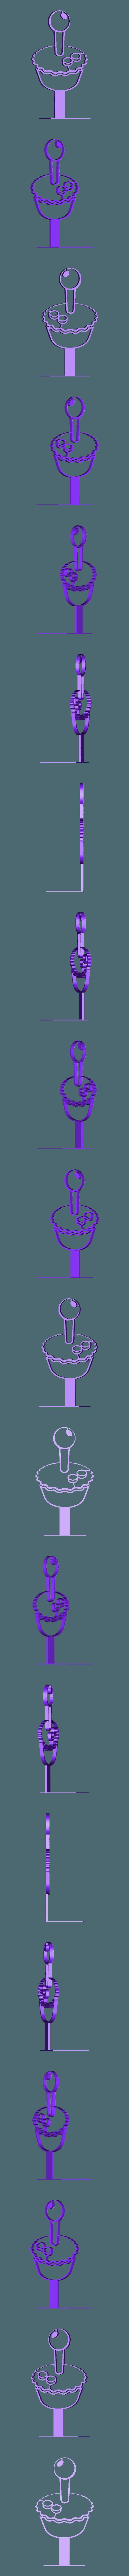 REtro-Pi-Logo-Emblem-Stand-BLocky.stl Download free STL file RetroPi Logo • 3D printing model, AwesomeA